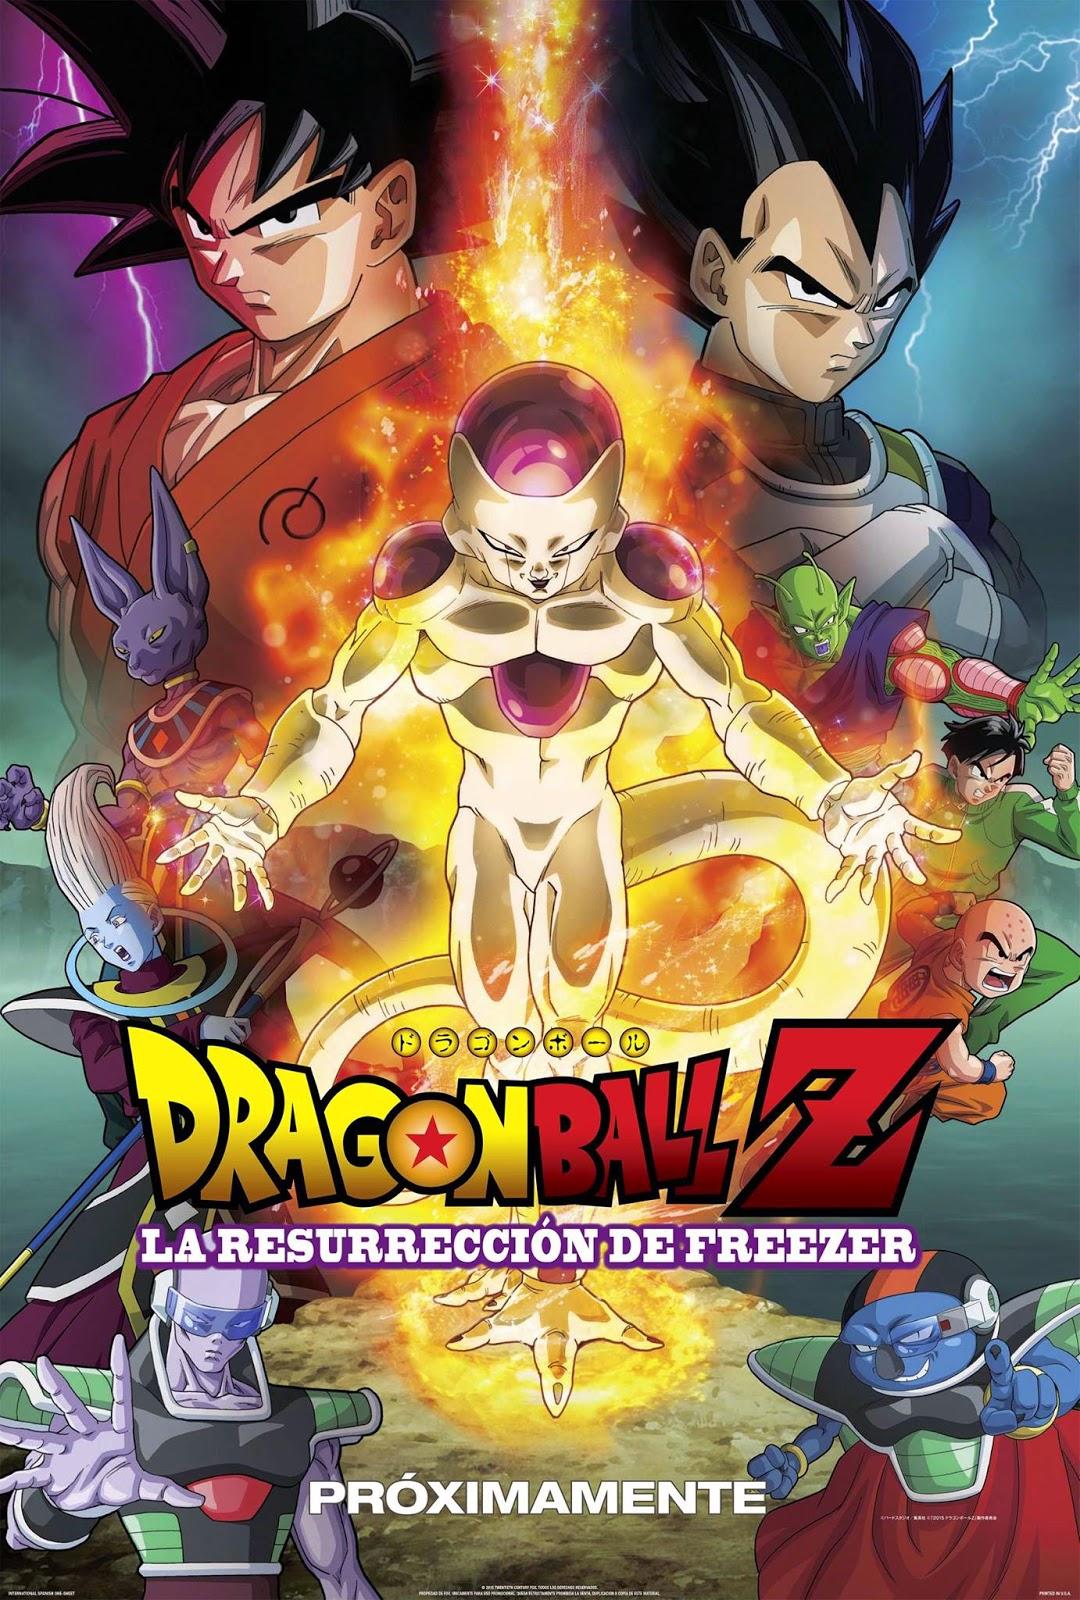 http://1.bp.blogspot.com/-N1Guerv8Rc0/VQkI61SxRBI/AAAAAAAADqM/ZC2qSovd0EM/s1600/Dragon_Ball_Z_La_Resurrecci%C3%B3n_De_Freezer_Poster_Oficial_Latino_JPosters.jpg